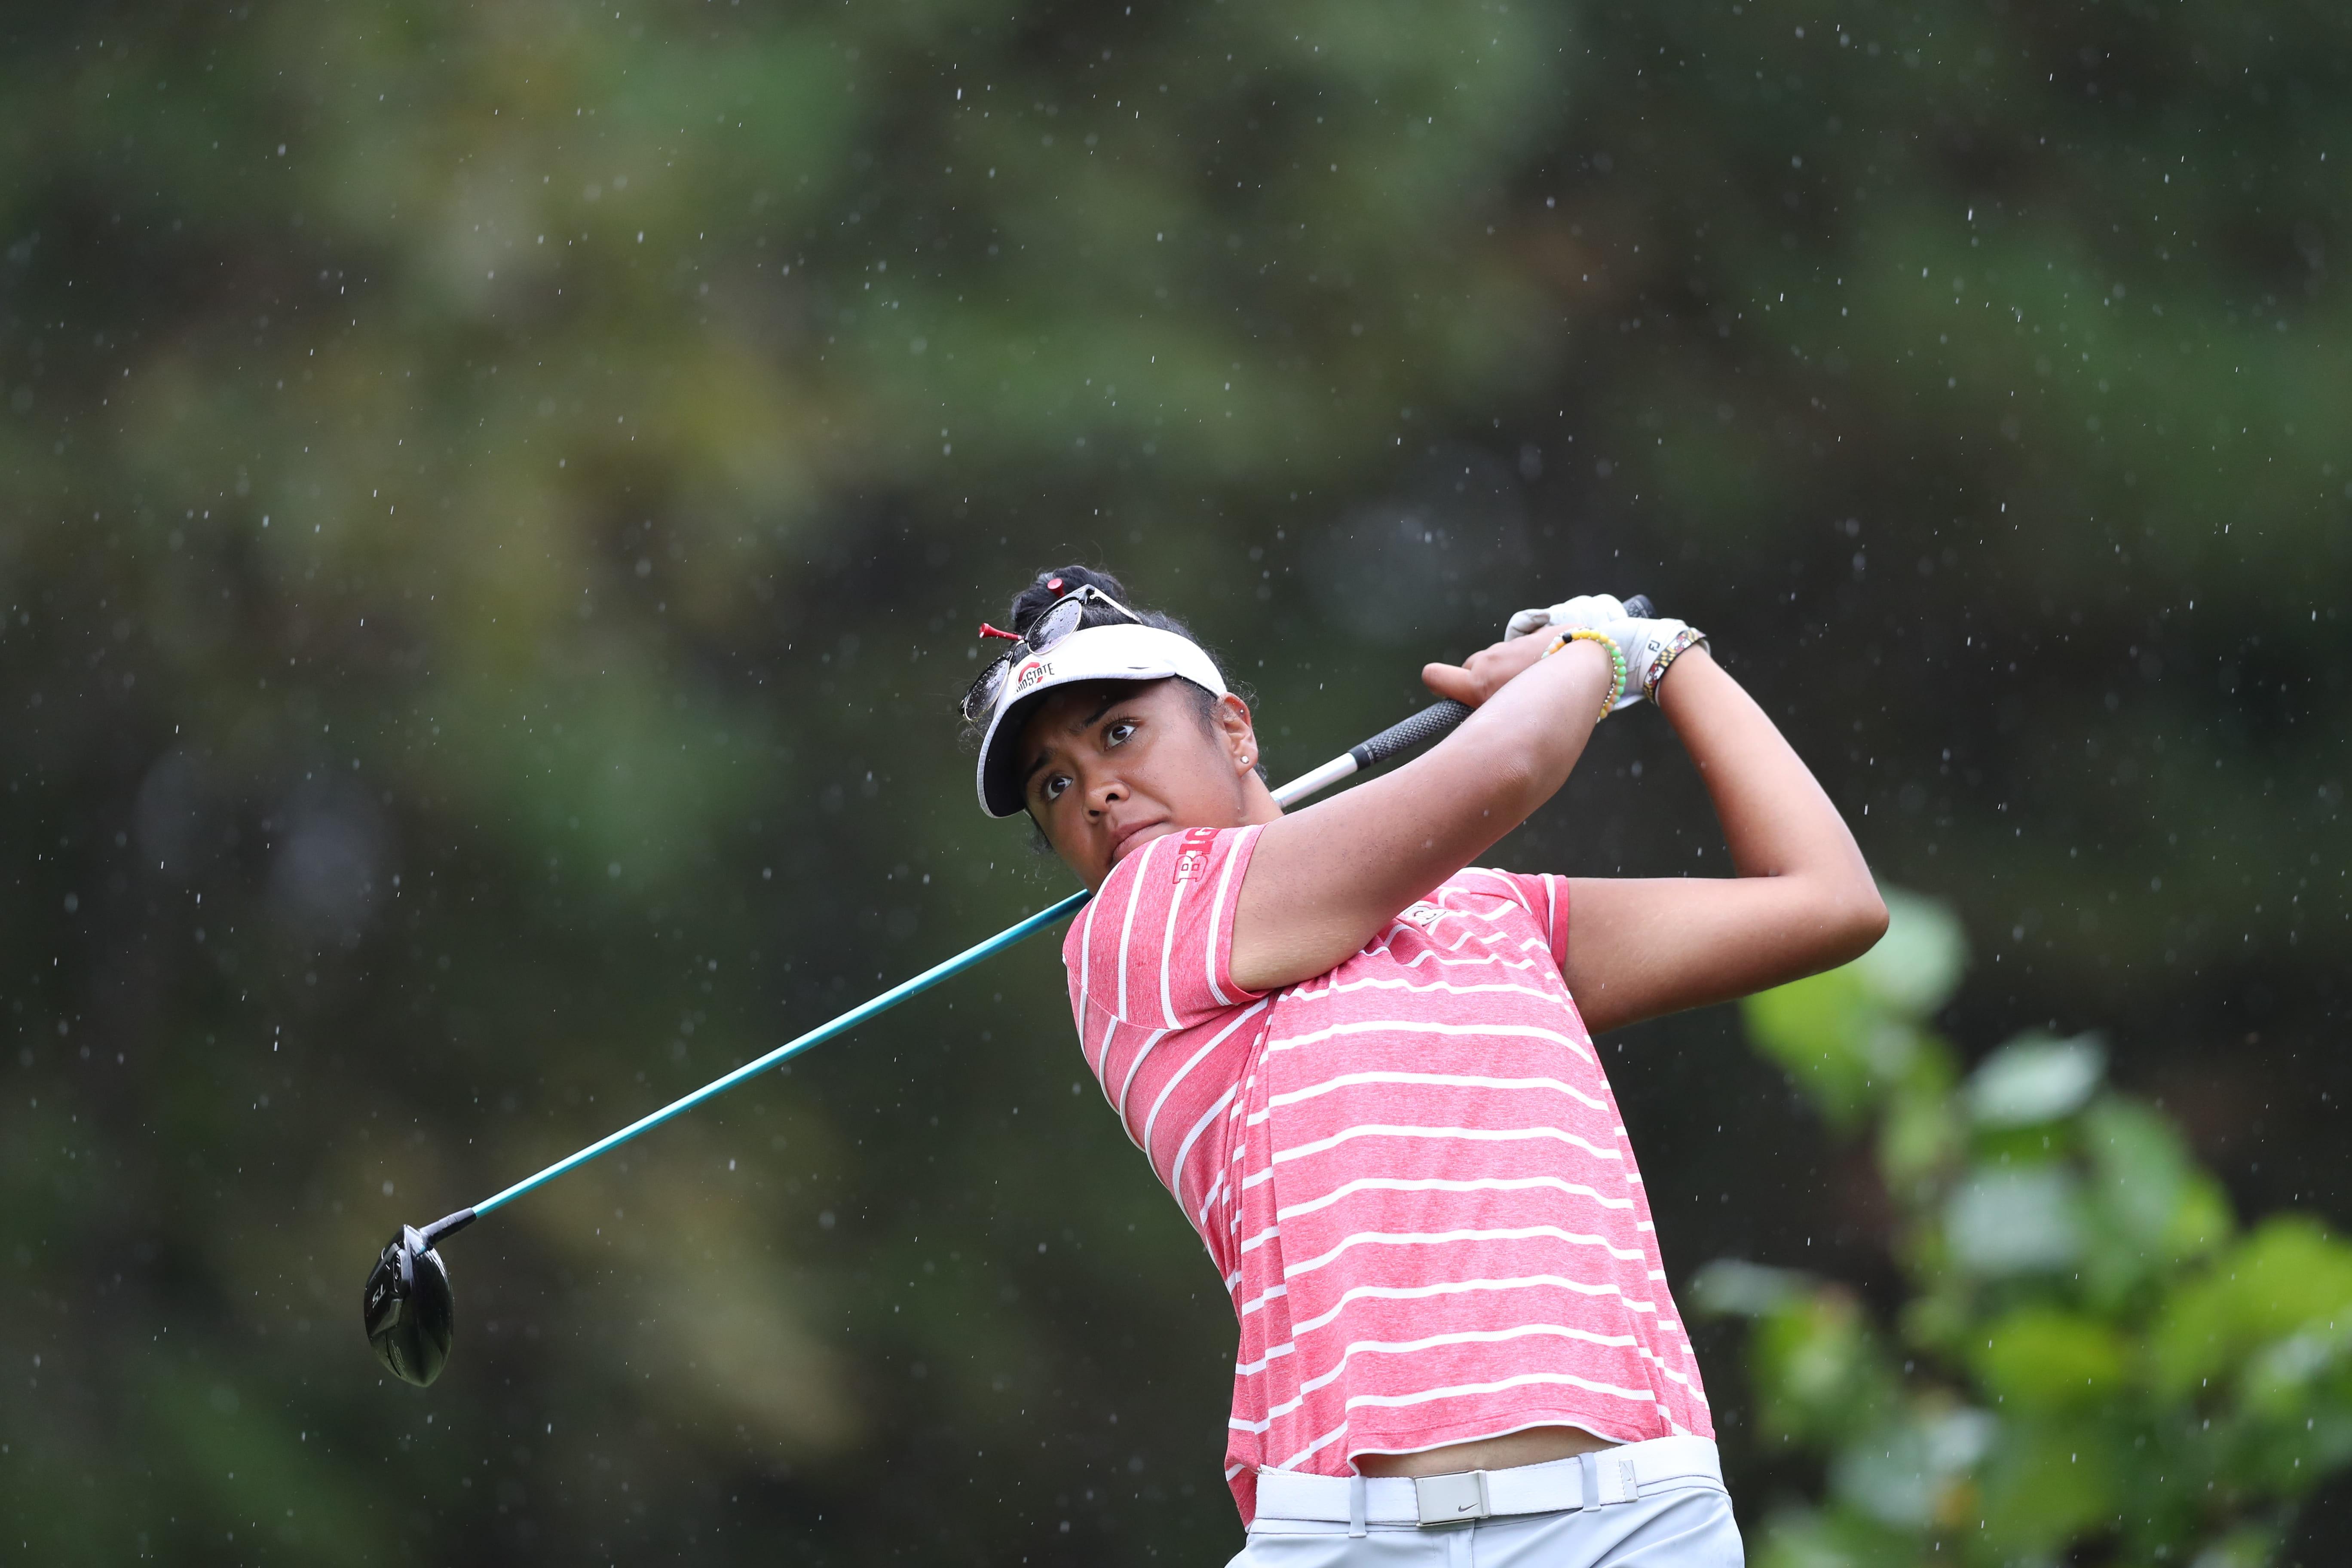 Aneka Seumanutafa swinging a golf club